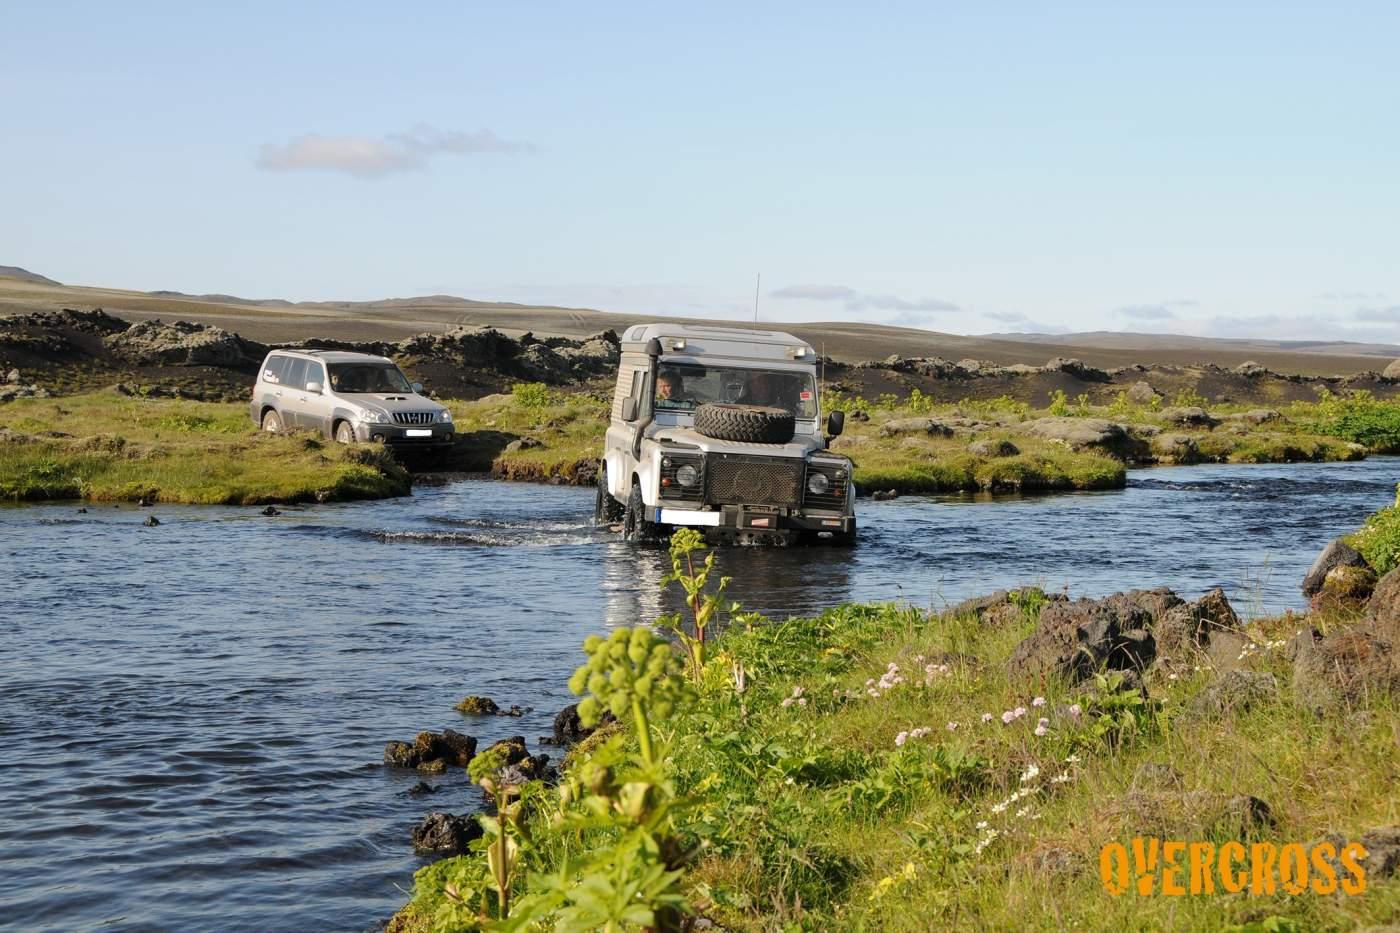 Geländewagen Offroad Island Overcross